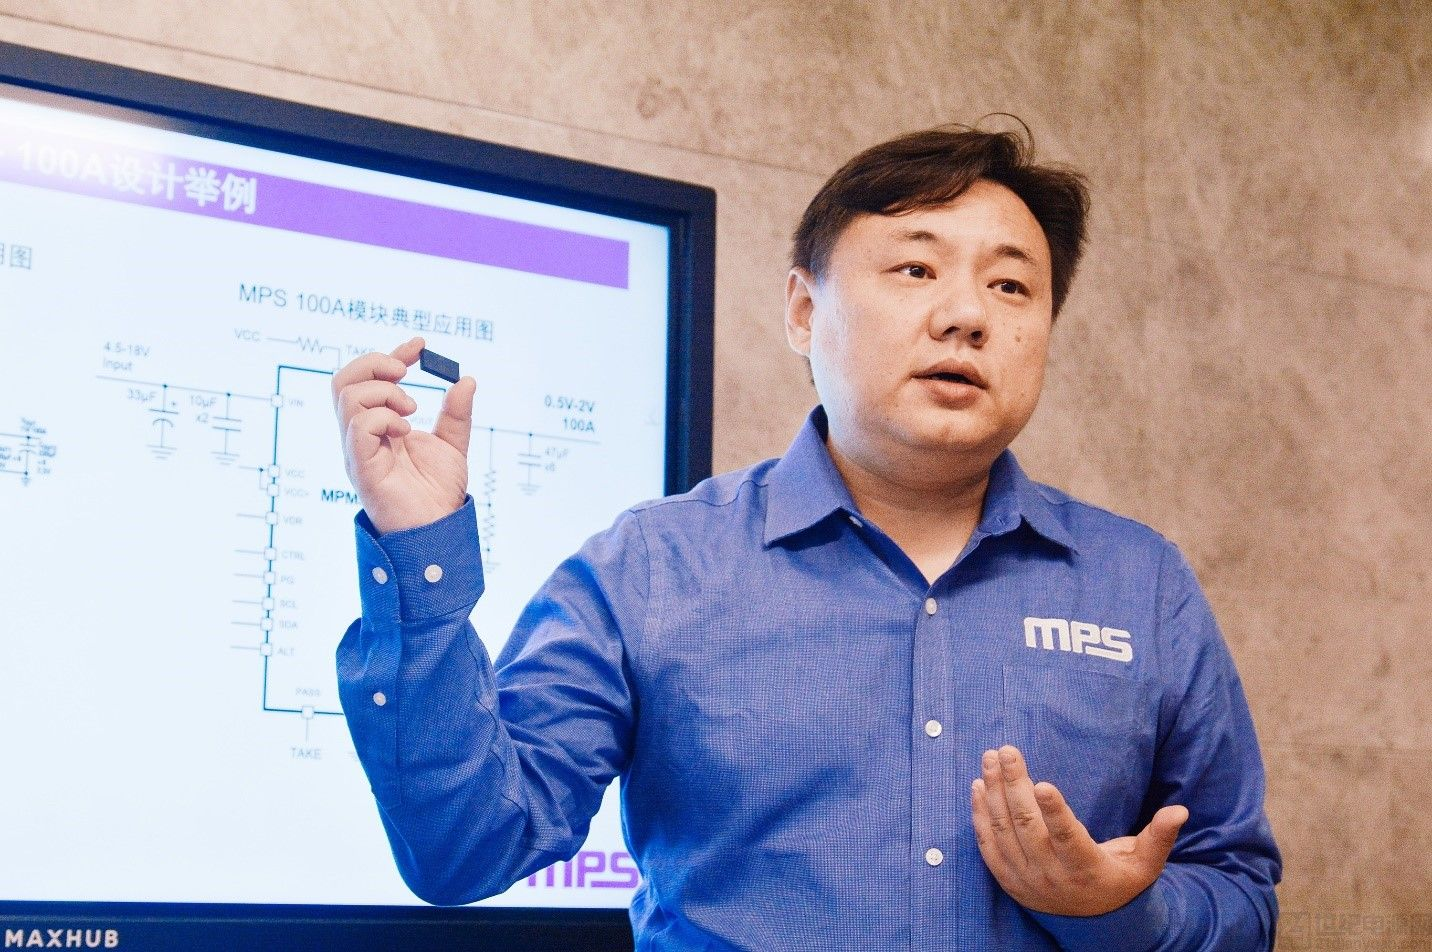 MPS 推出系列電源模塊 —— 高性能電源方案助力工業 4.0 以及 5G 基站設計